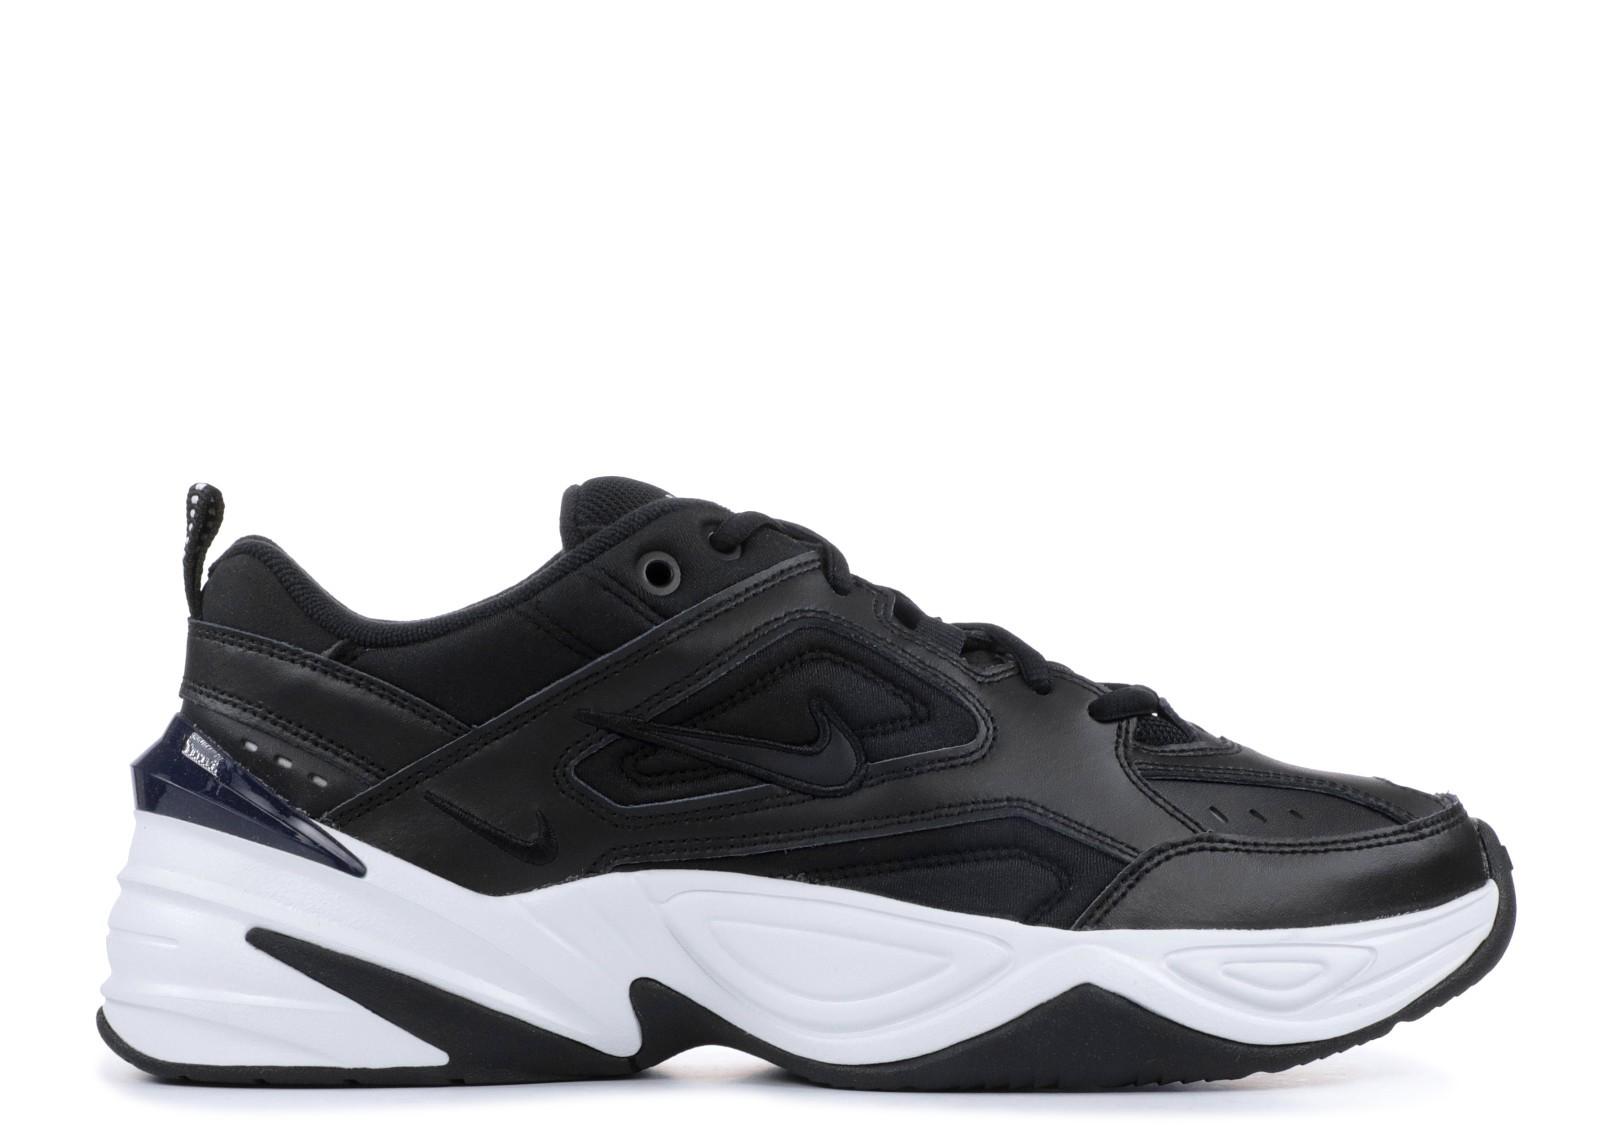 33f2f9ff7dc W Nike M2k Tekno Off White Black Obsidian AO3108-003 - Febbuy